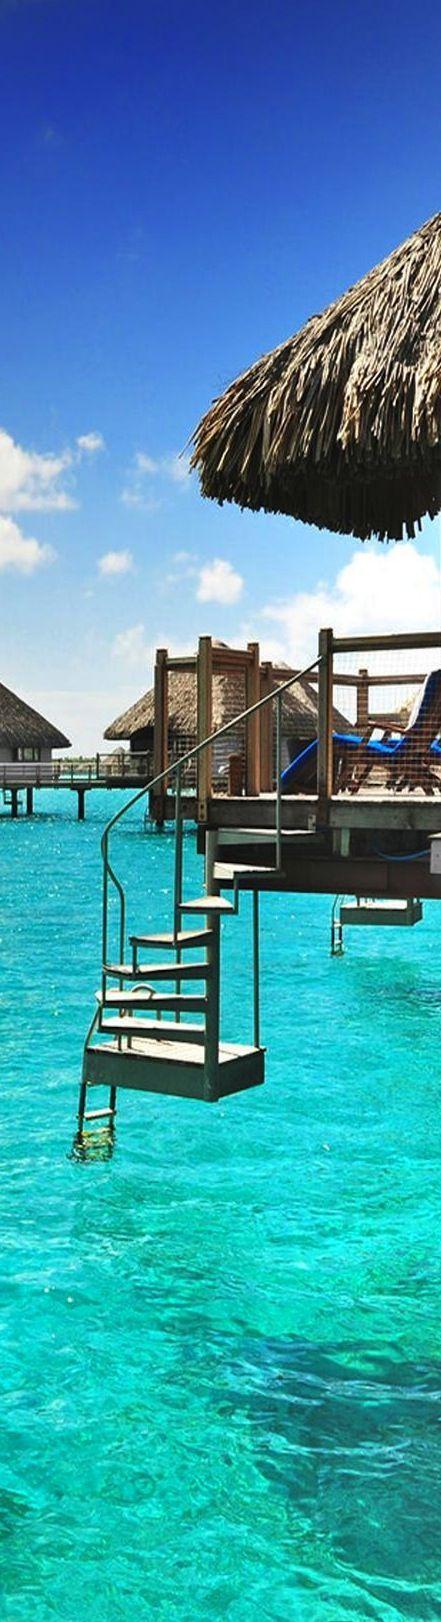 Bora Bora- Nothing better than going to Bora Bora for a luxury relaxing  honeymoon.